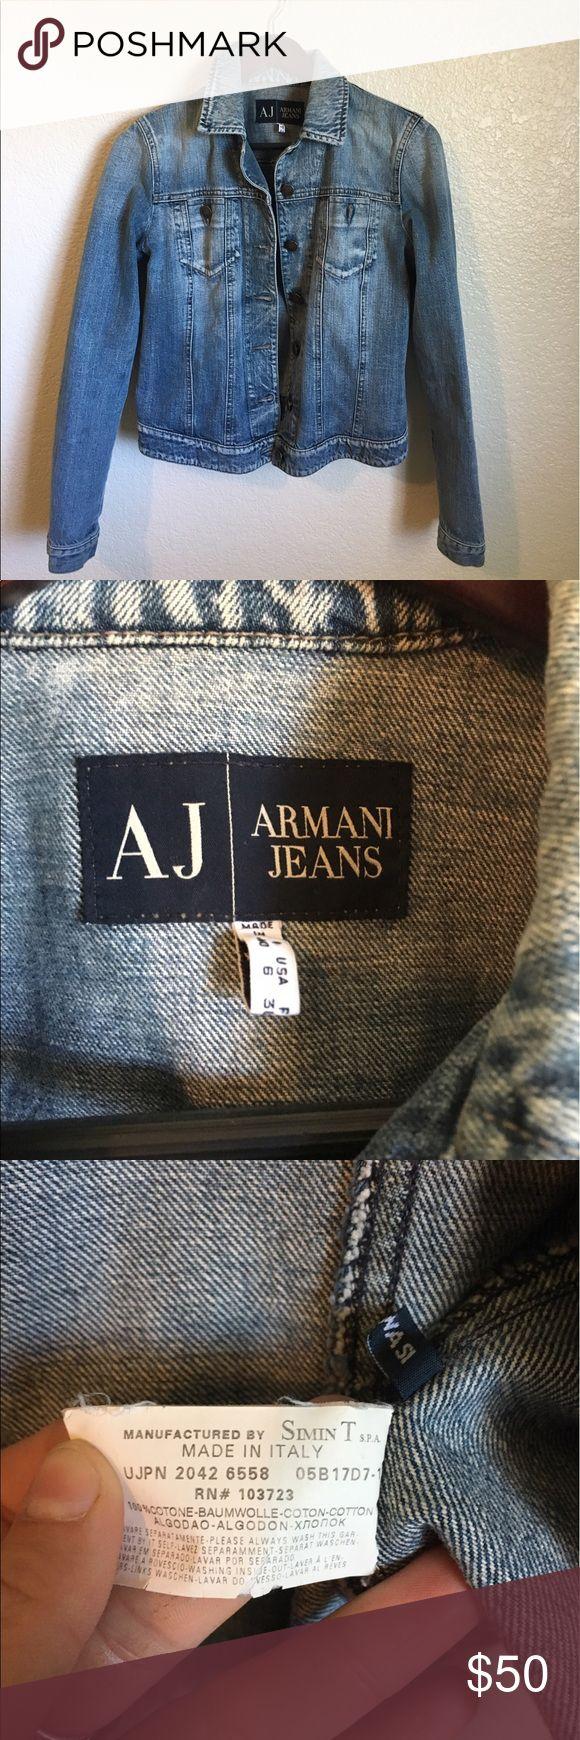 New condition Armani jean jacket New condition Armani jean jacket never worn Armani Jeans Jackets & Coats Jean Jackets